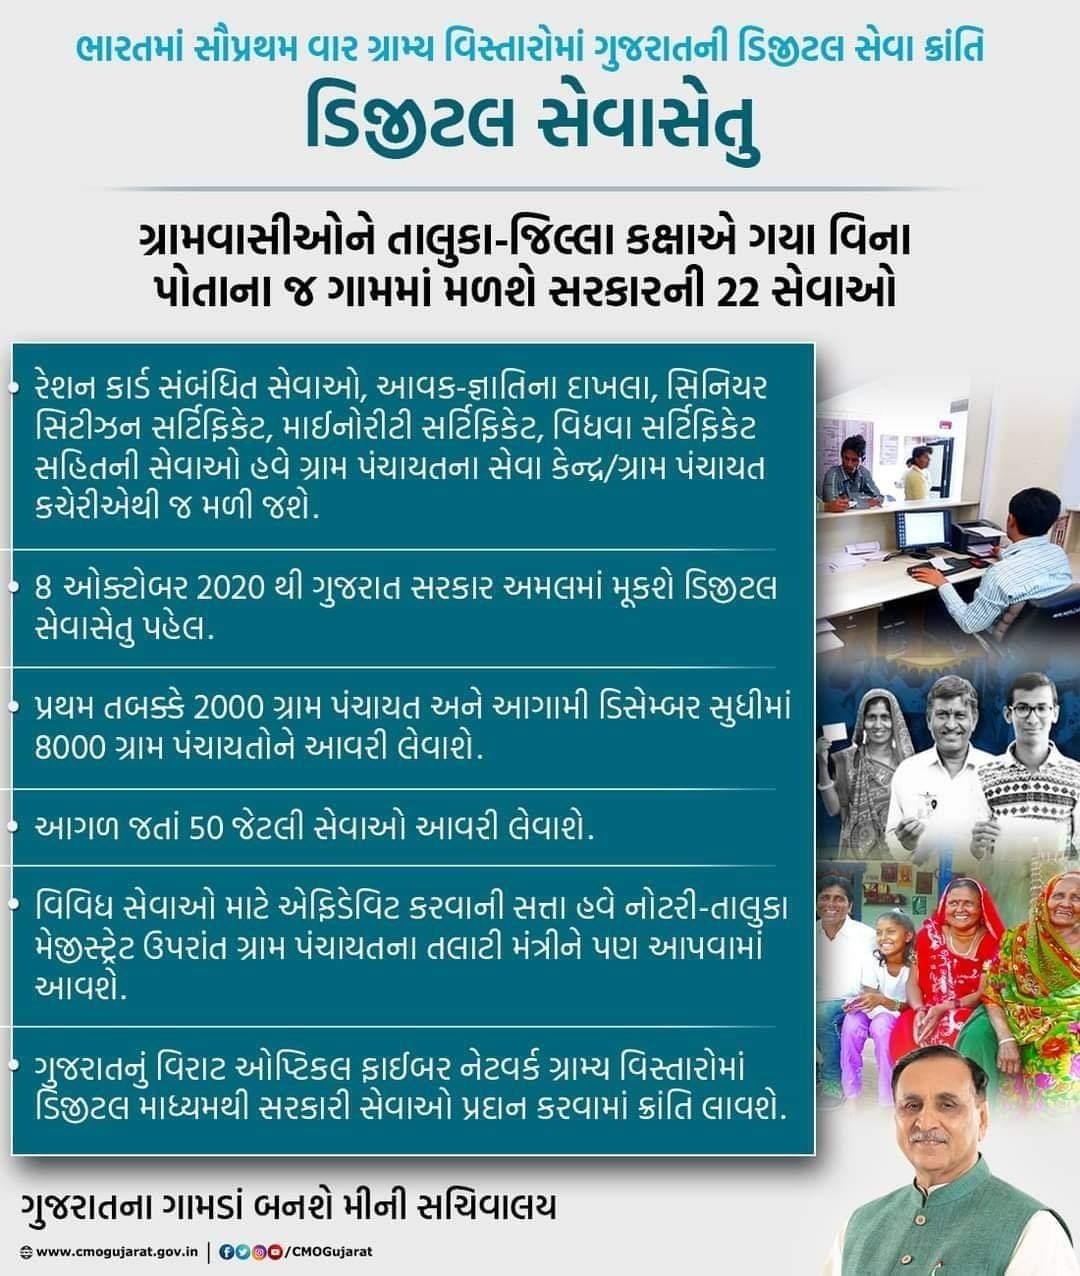 22 Digital Service at village In Gujarat